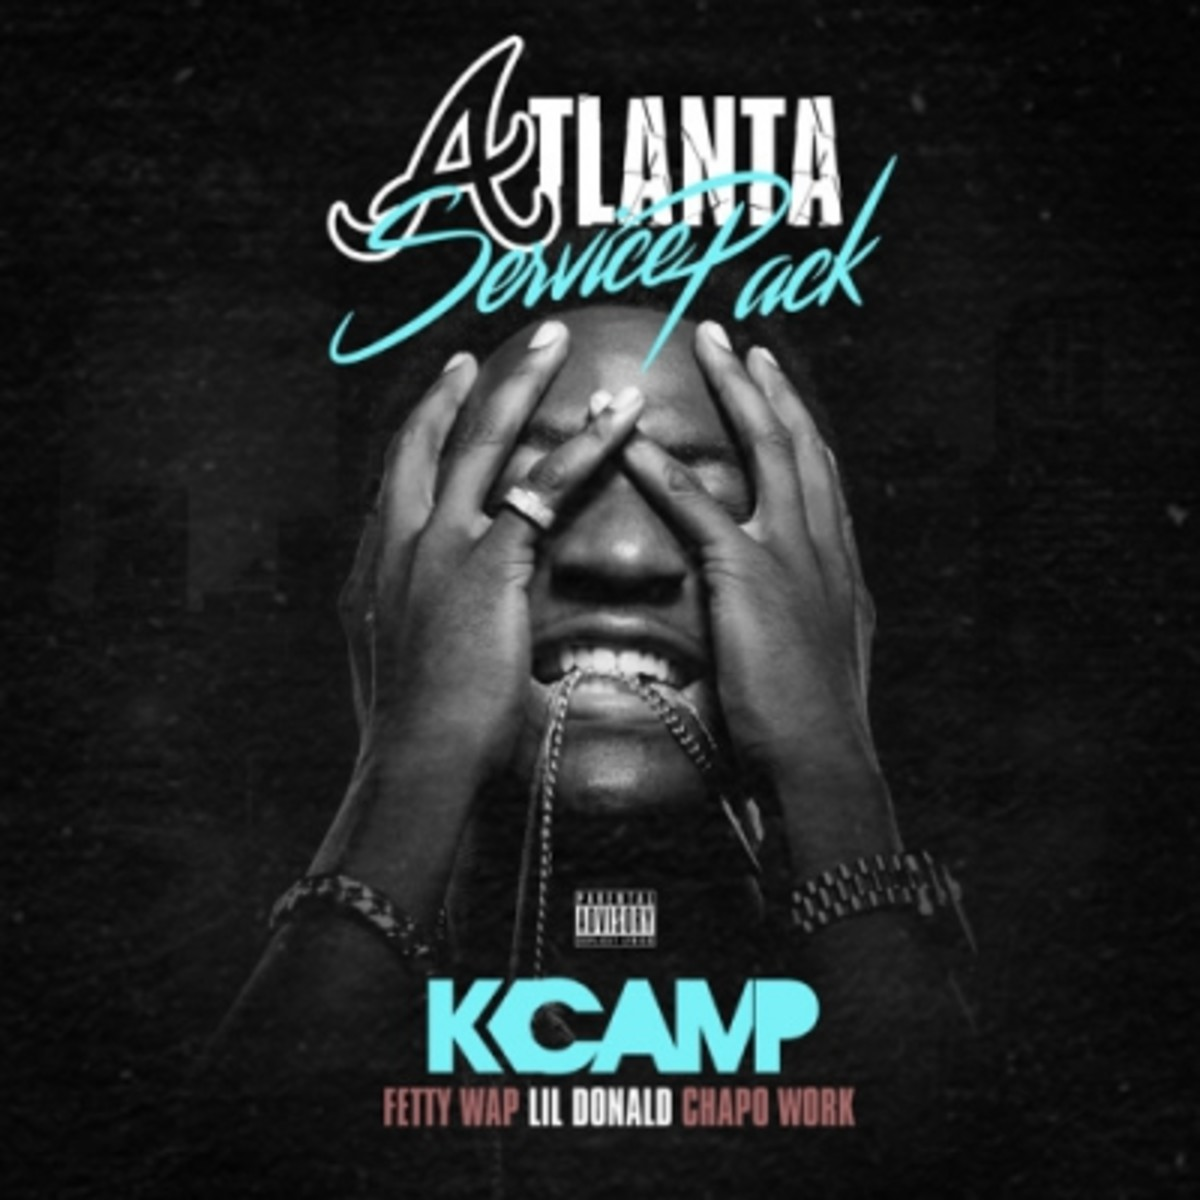 k-camp-atlanta-service-pack.jpg